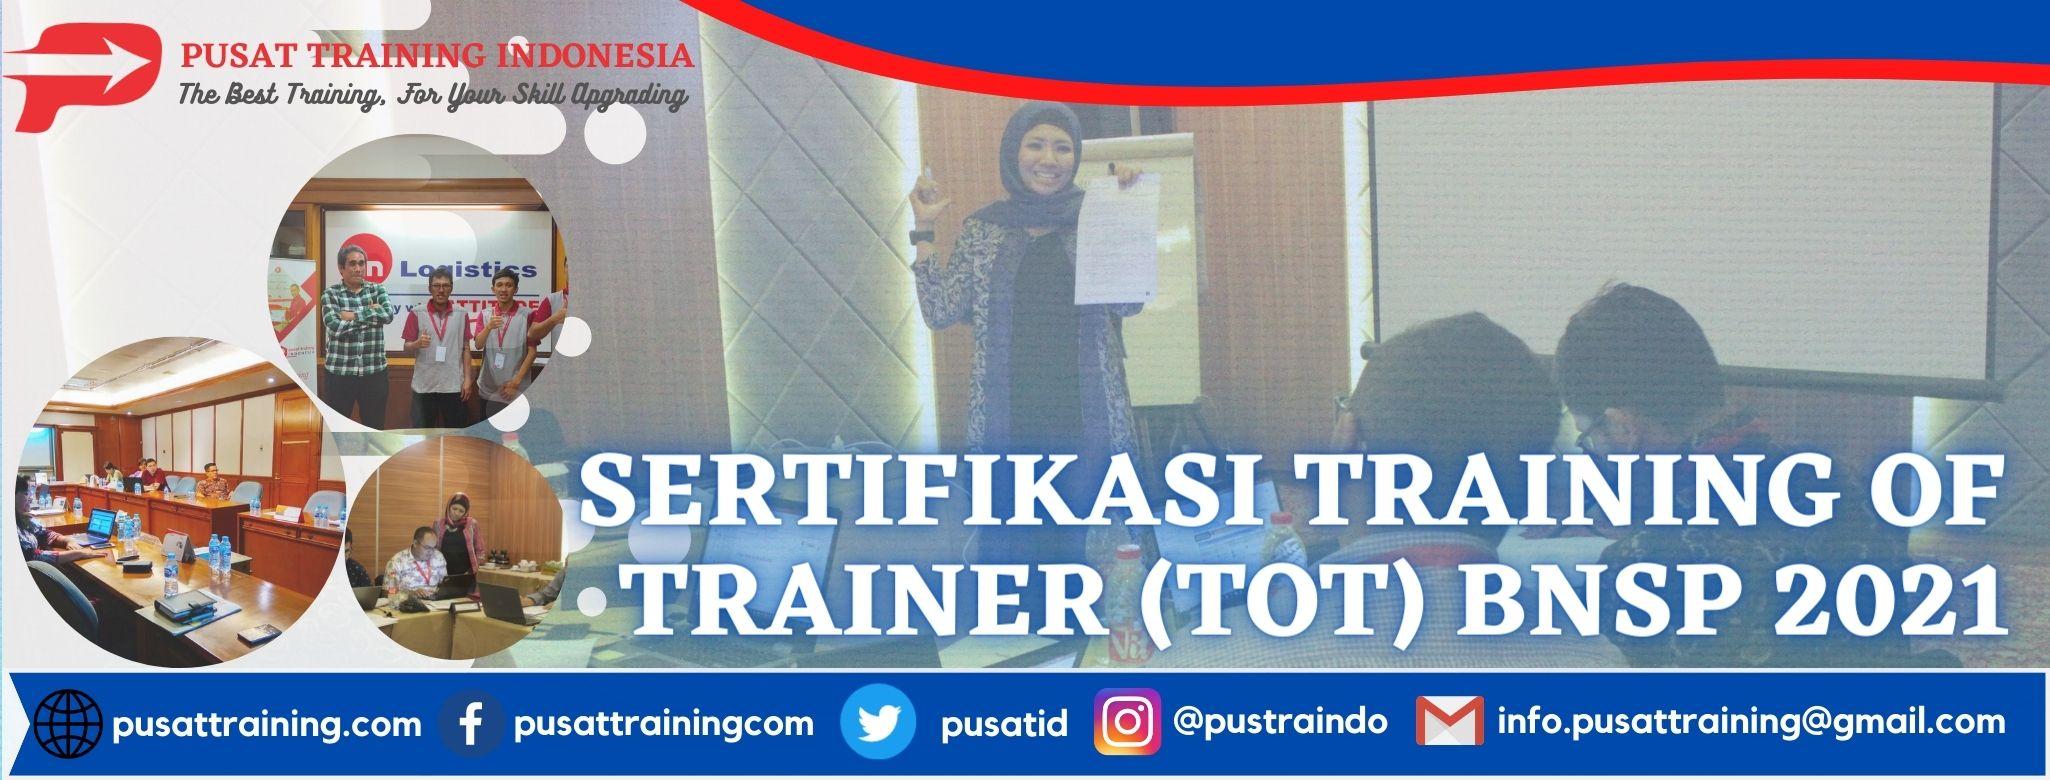 sertifikasi-training-of-trainer-tot-bnsp-2021